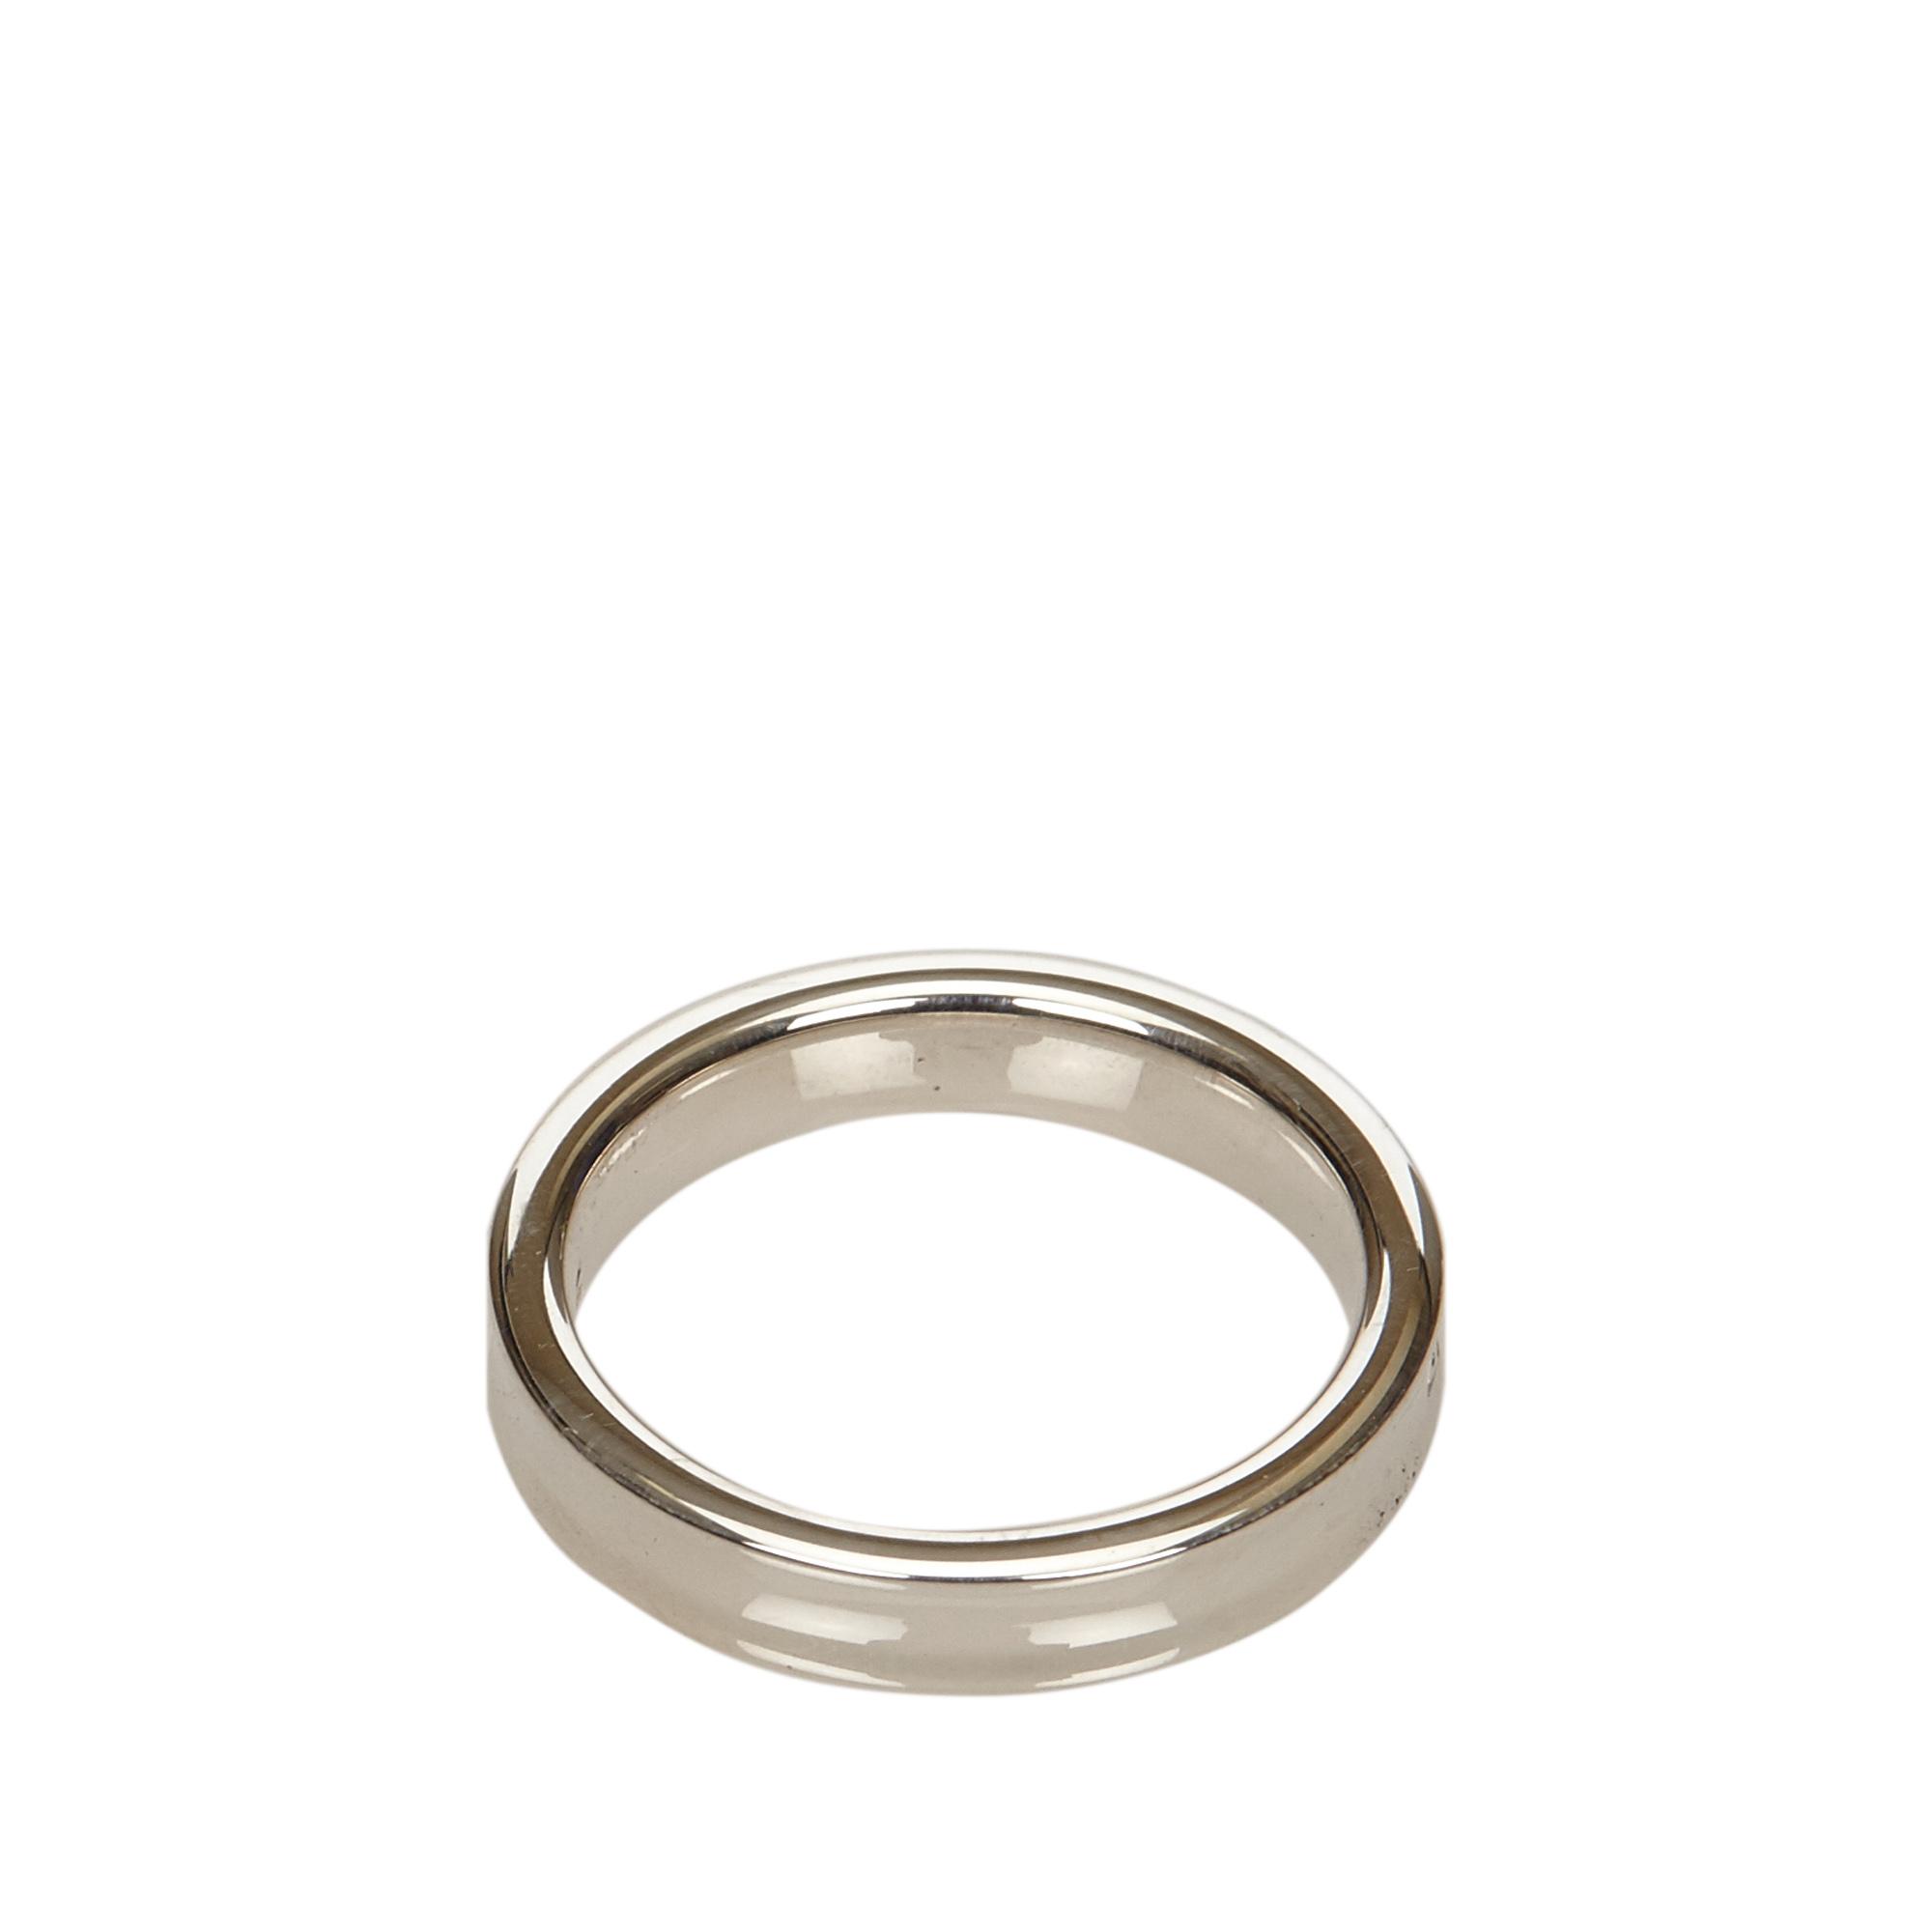 Tiffany & Co. Tiffany 1837 Silver Ring Size 51